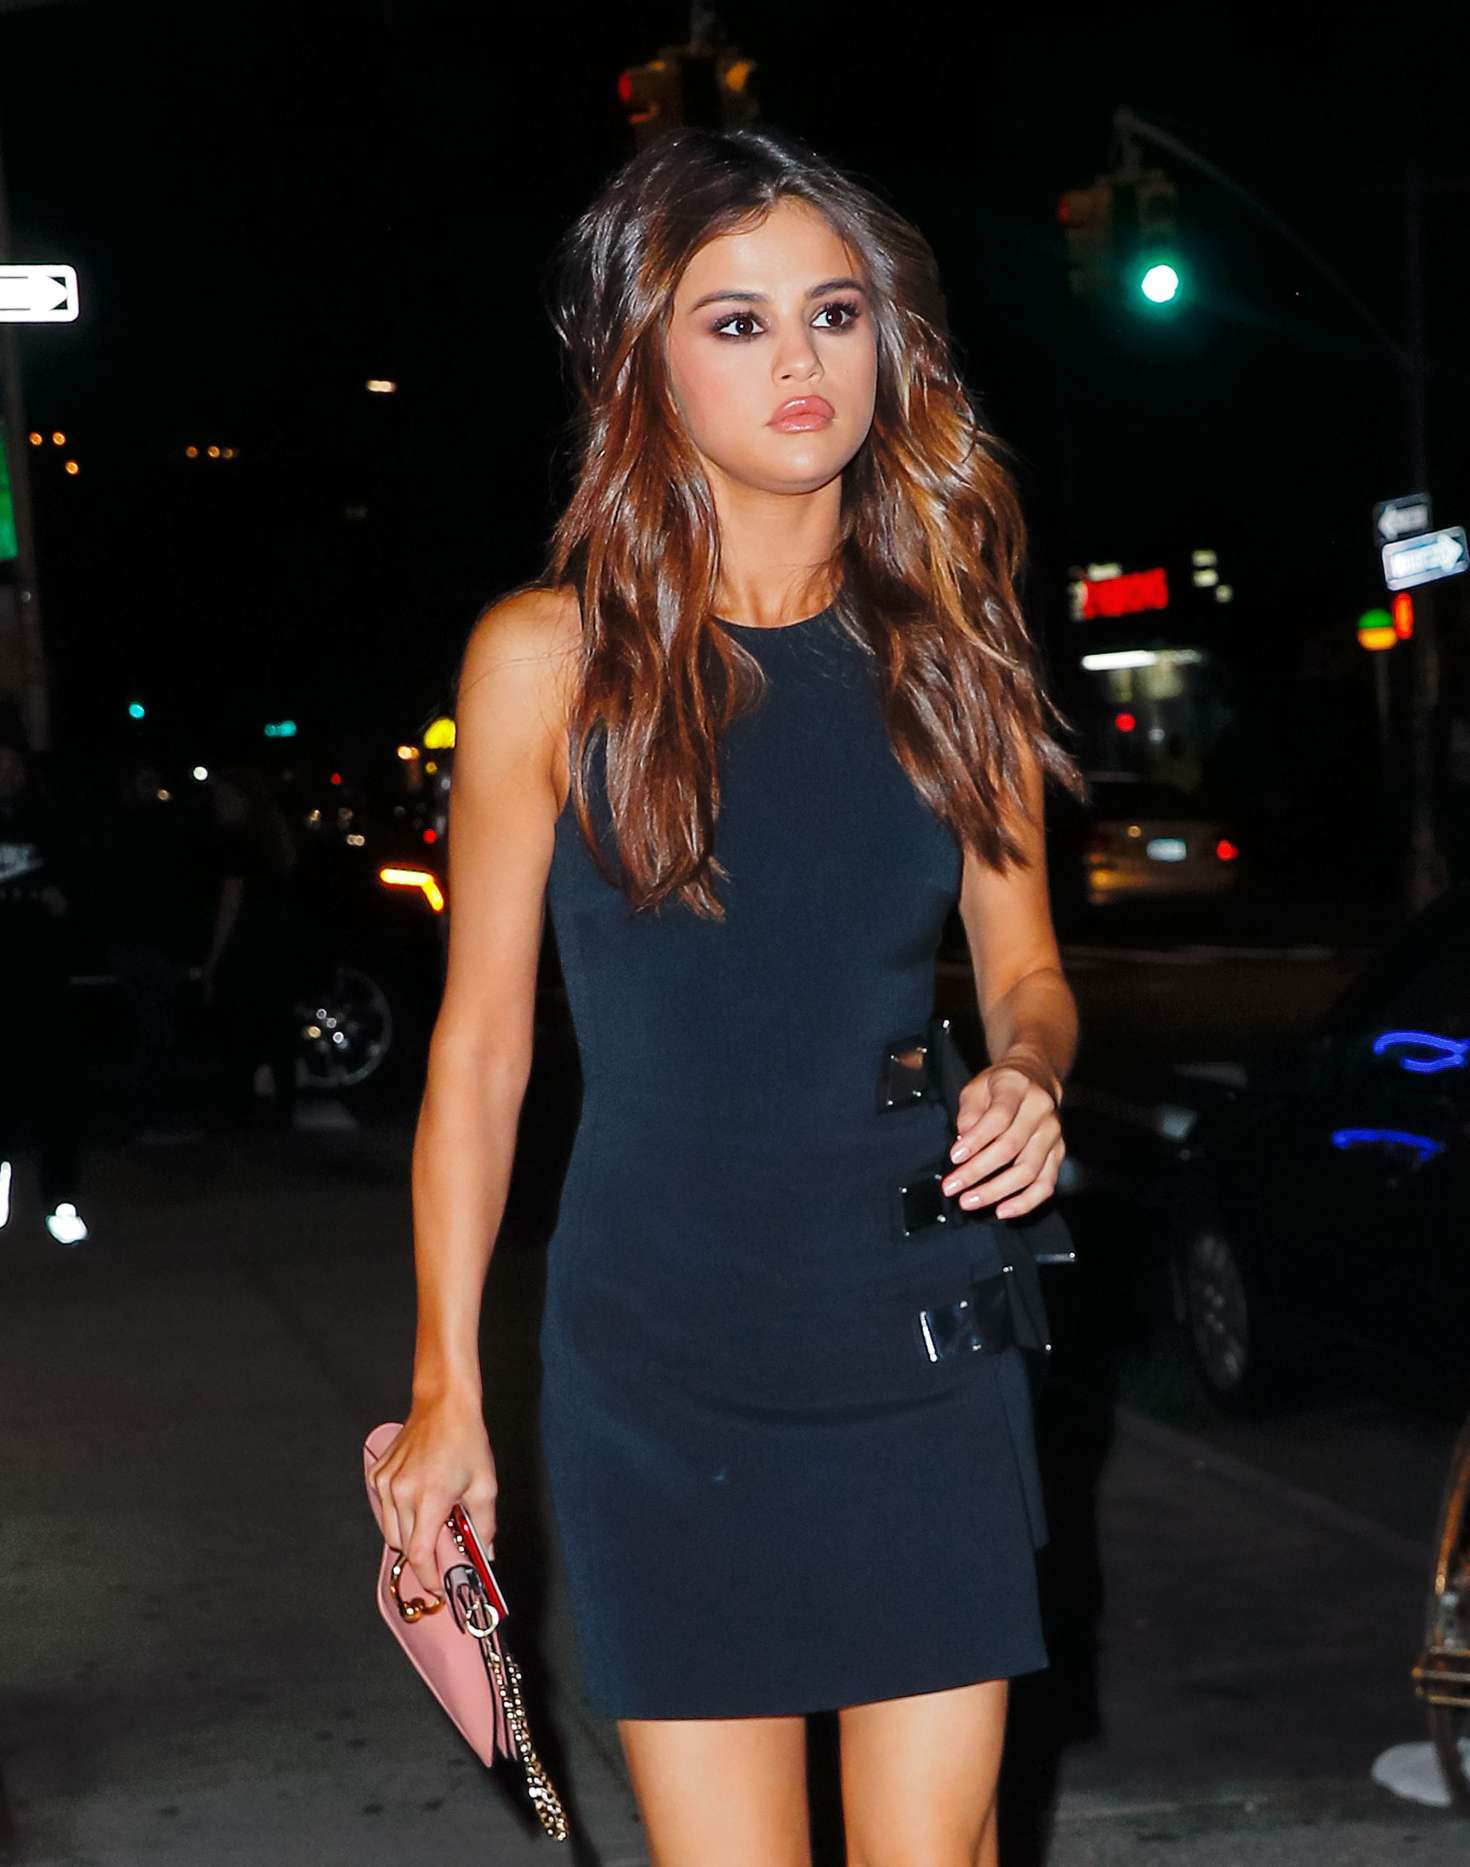 selena gomez in mini dress 32 gotceleb